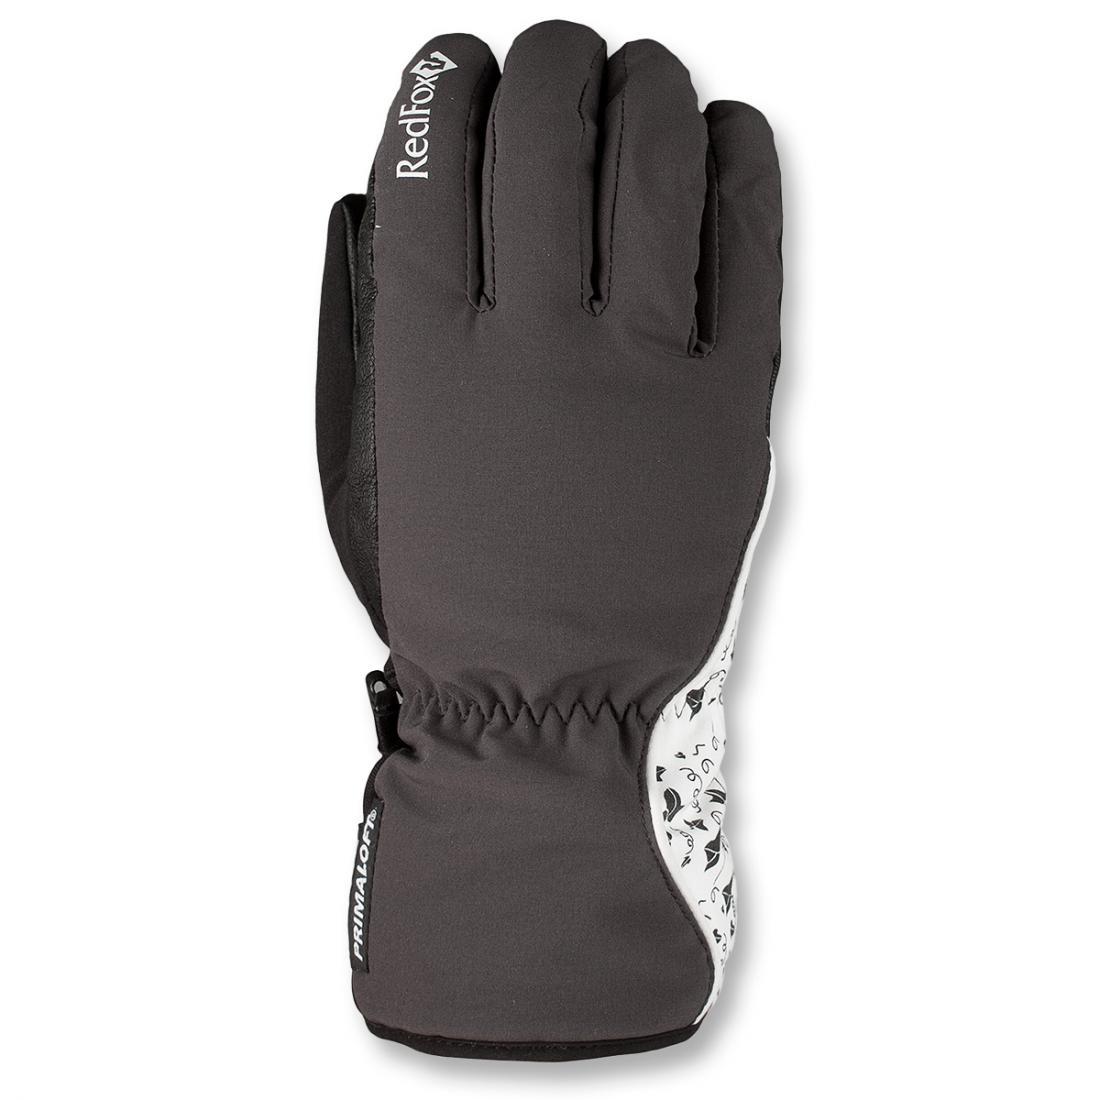 Перчатки женские RozaryПерчатки<br><br> Женская версия зимних прогулочных перчаток с утеплителем Primaloft®.<br><br><br> <br><br><br><br><br> Материал – Nylon DWR.<br><br> <br><br><br> Утеплитель – Primaloft®.<br><br> <br><br><br> Вставки, препятствующ...<br><br>Цвет: Белый<br>Размер: S